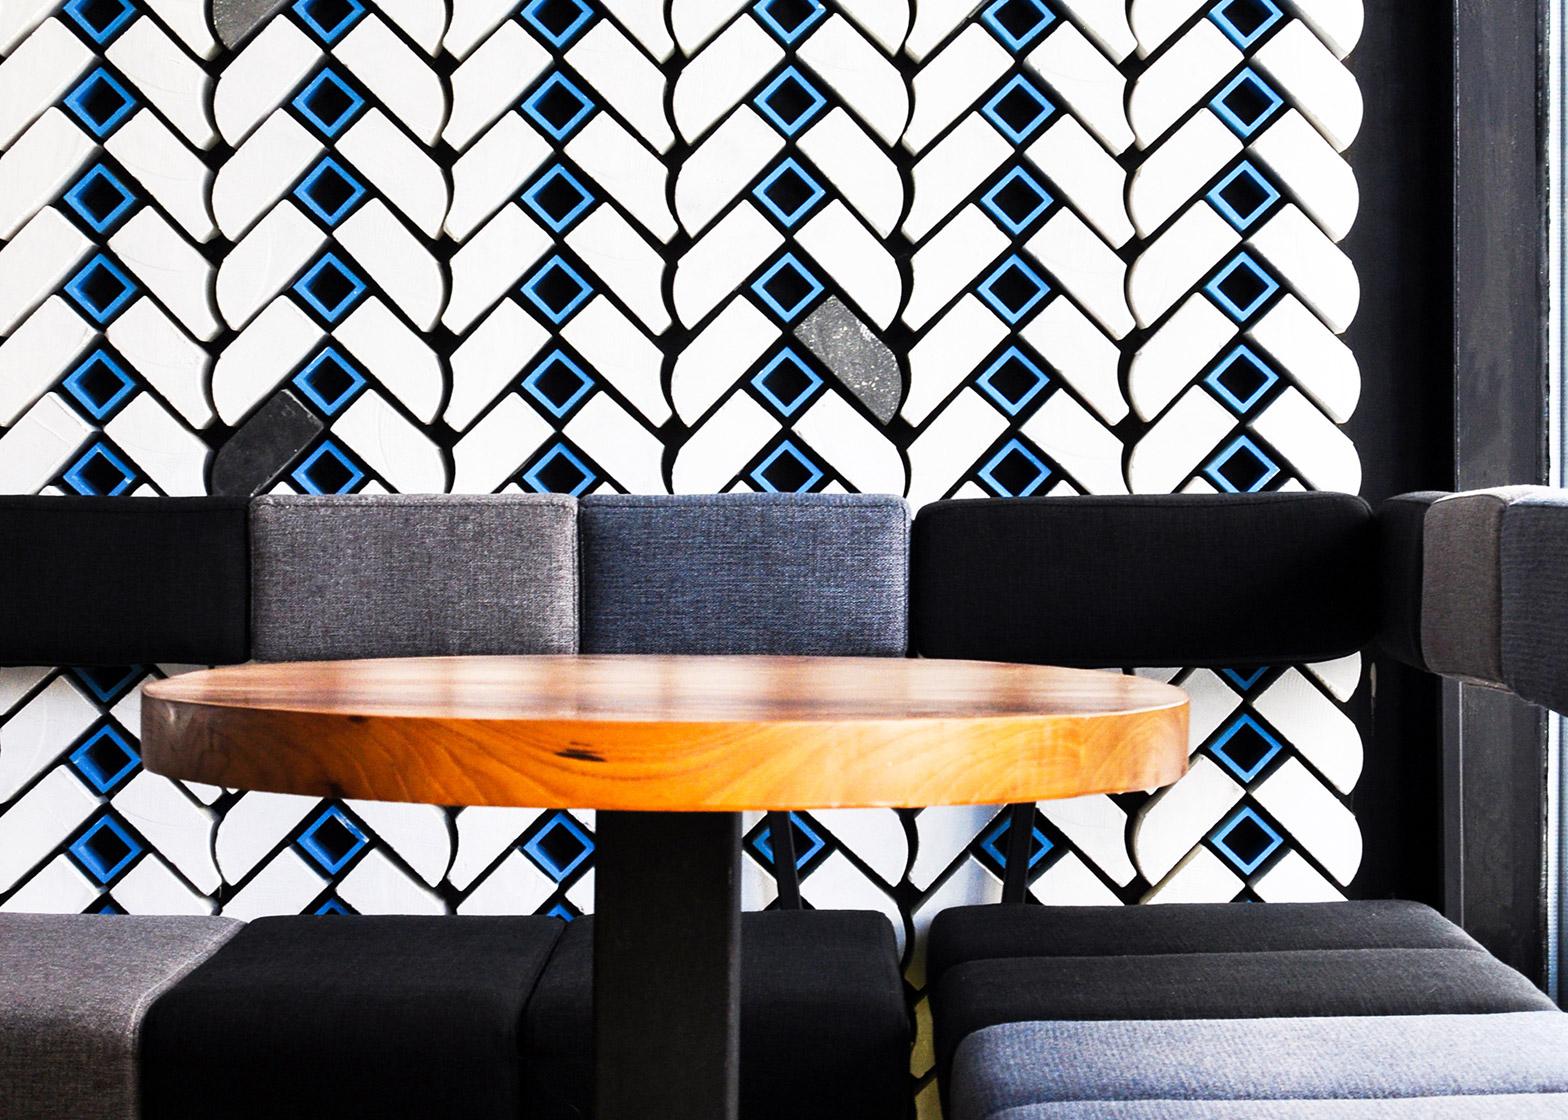 Beijing bar by Studio Ramoprimo has chevron-patterned walls